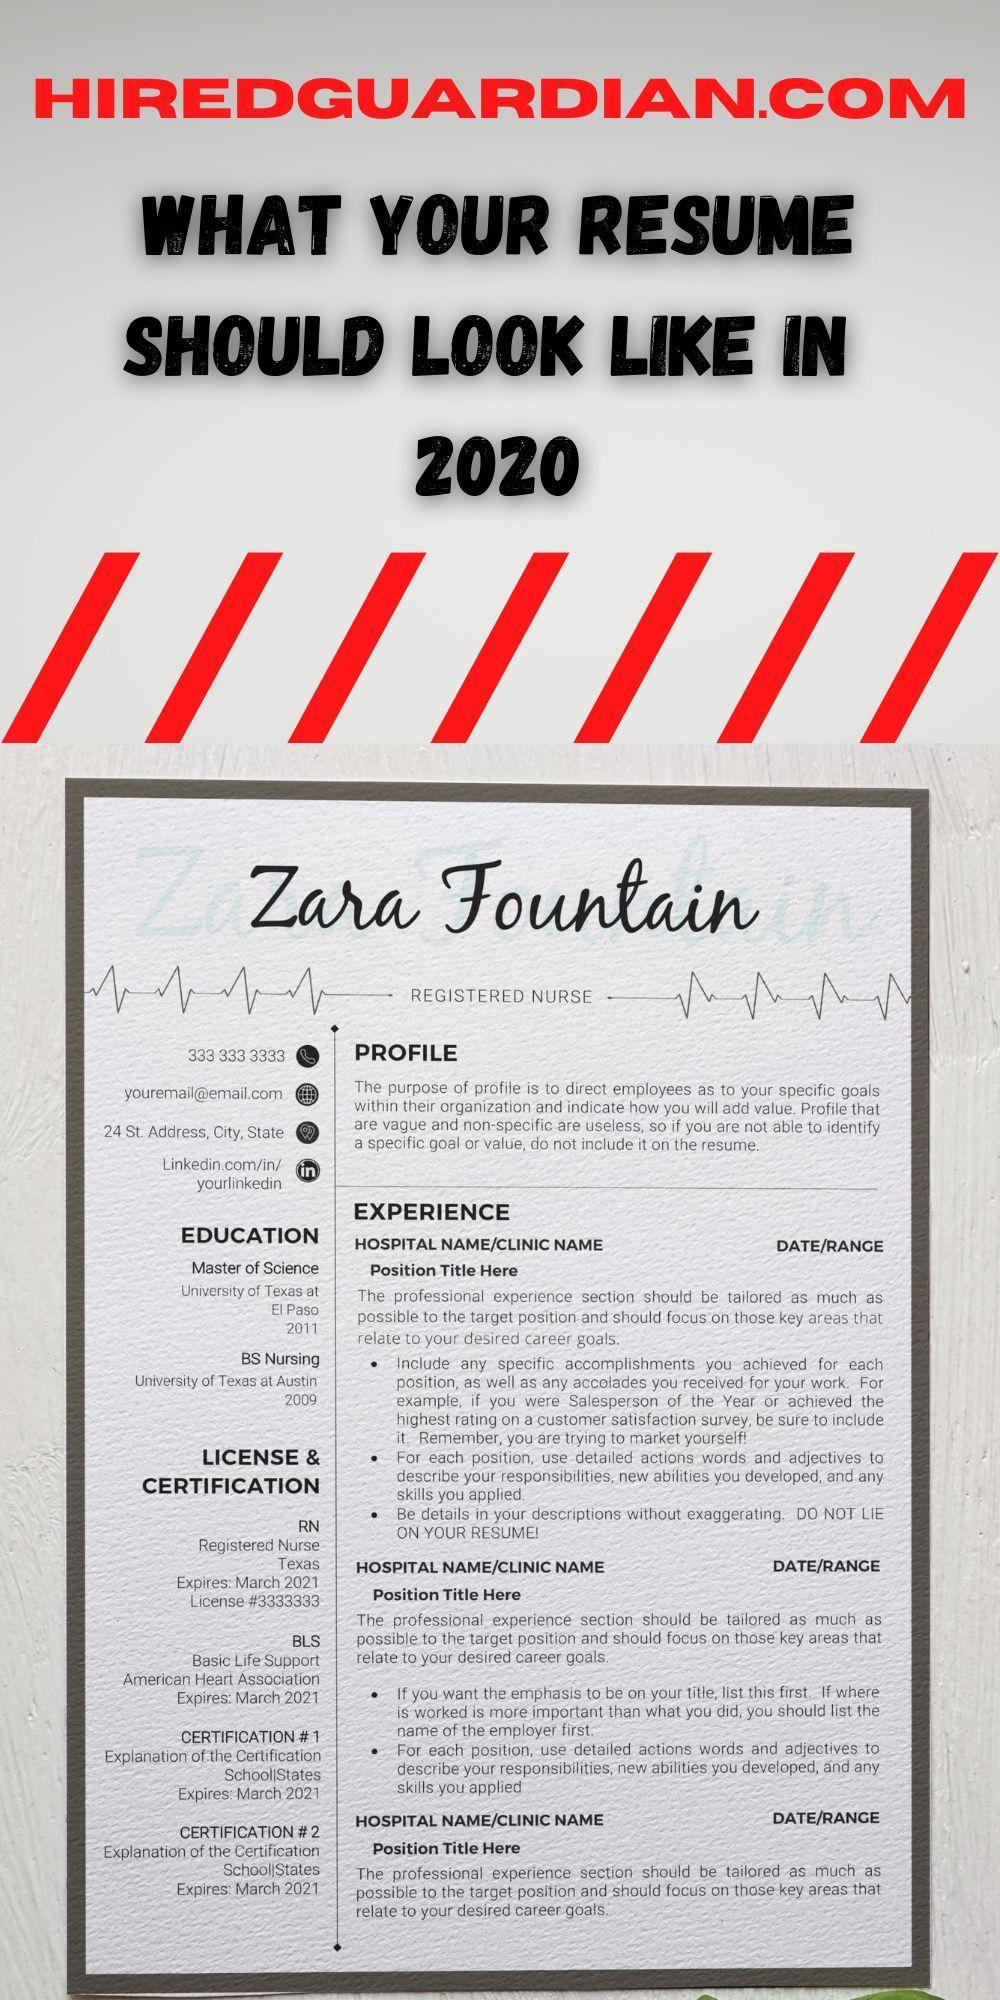 Registered Nurse Resume Template Nurse Cv Template For Word Etsy In 2020 Nursing Resume Template Rn Resume Template Registered Nurse Resume